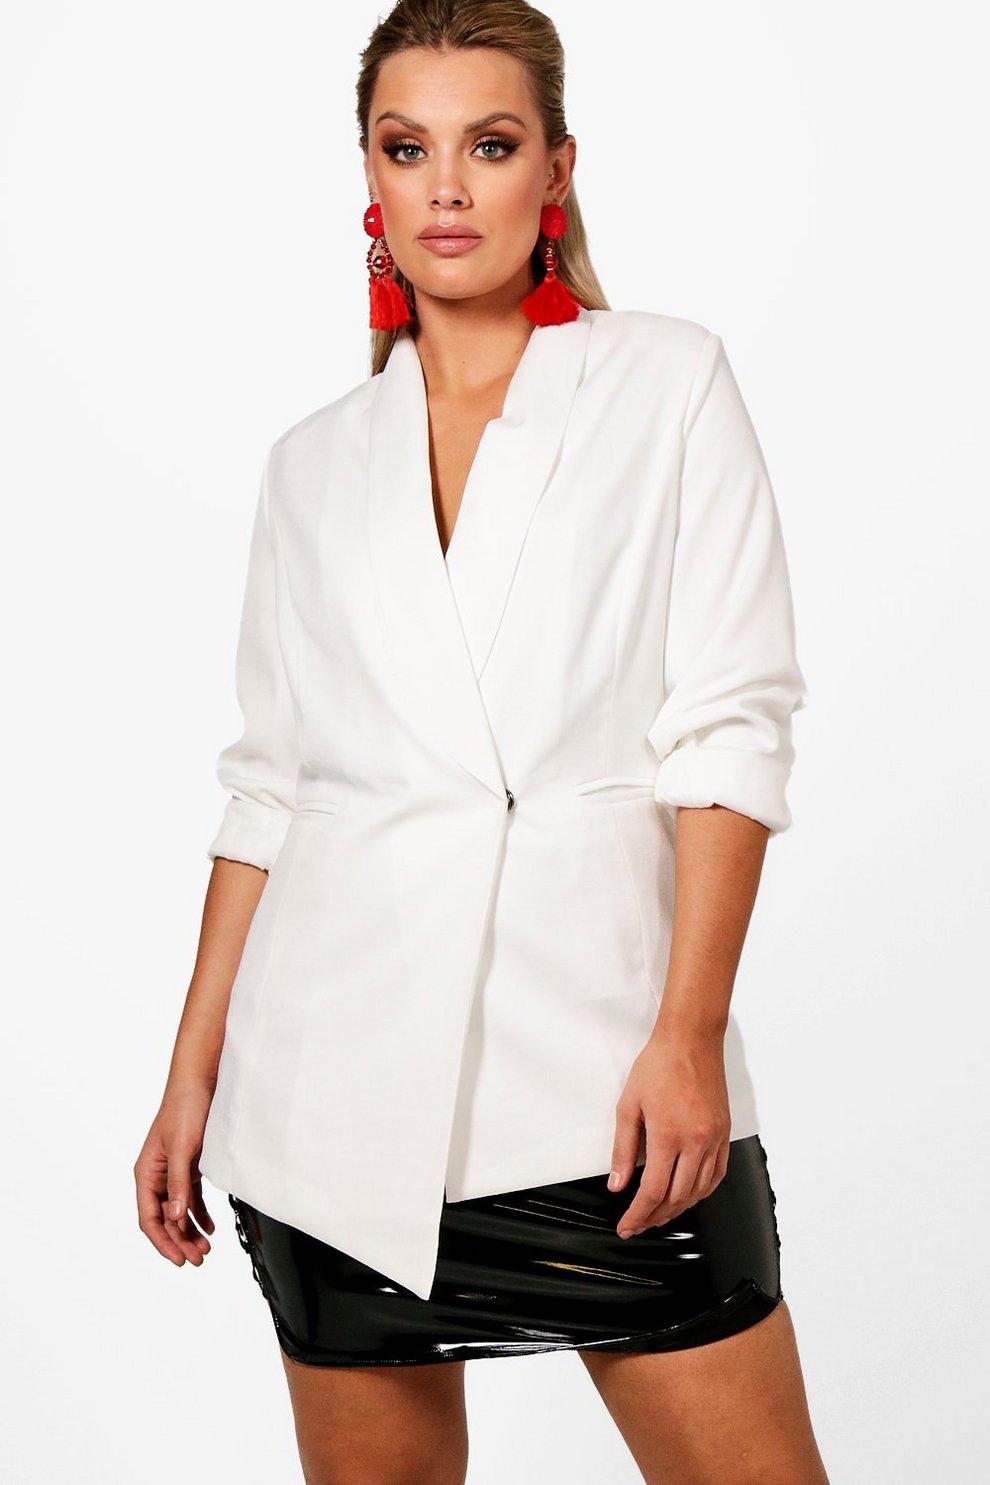 Boohoo Plus Asymmetric Wrap Blazer Amazon Cheap Price How Much Buy Cheap Hot Sale M4X5RJdN